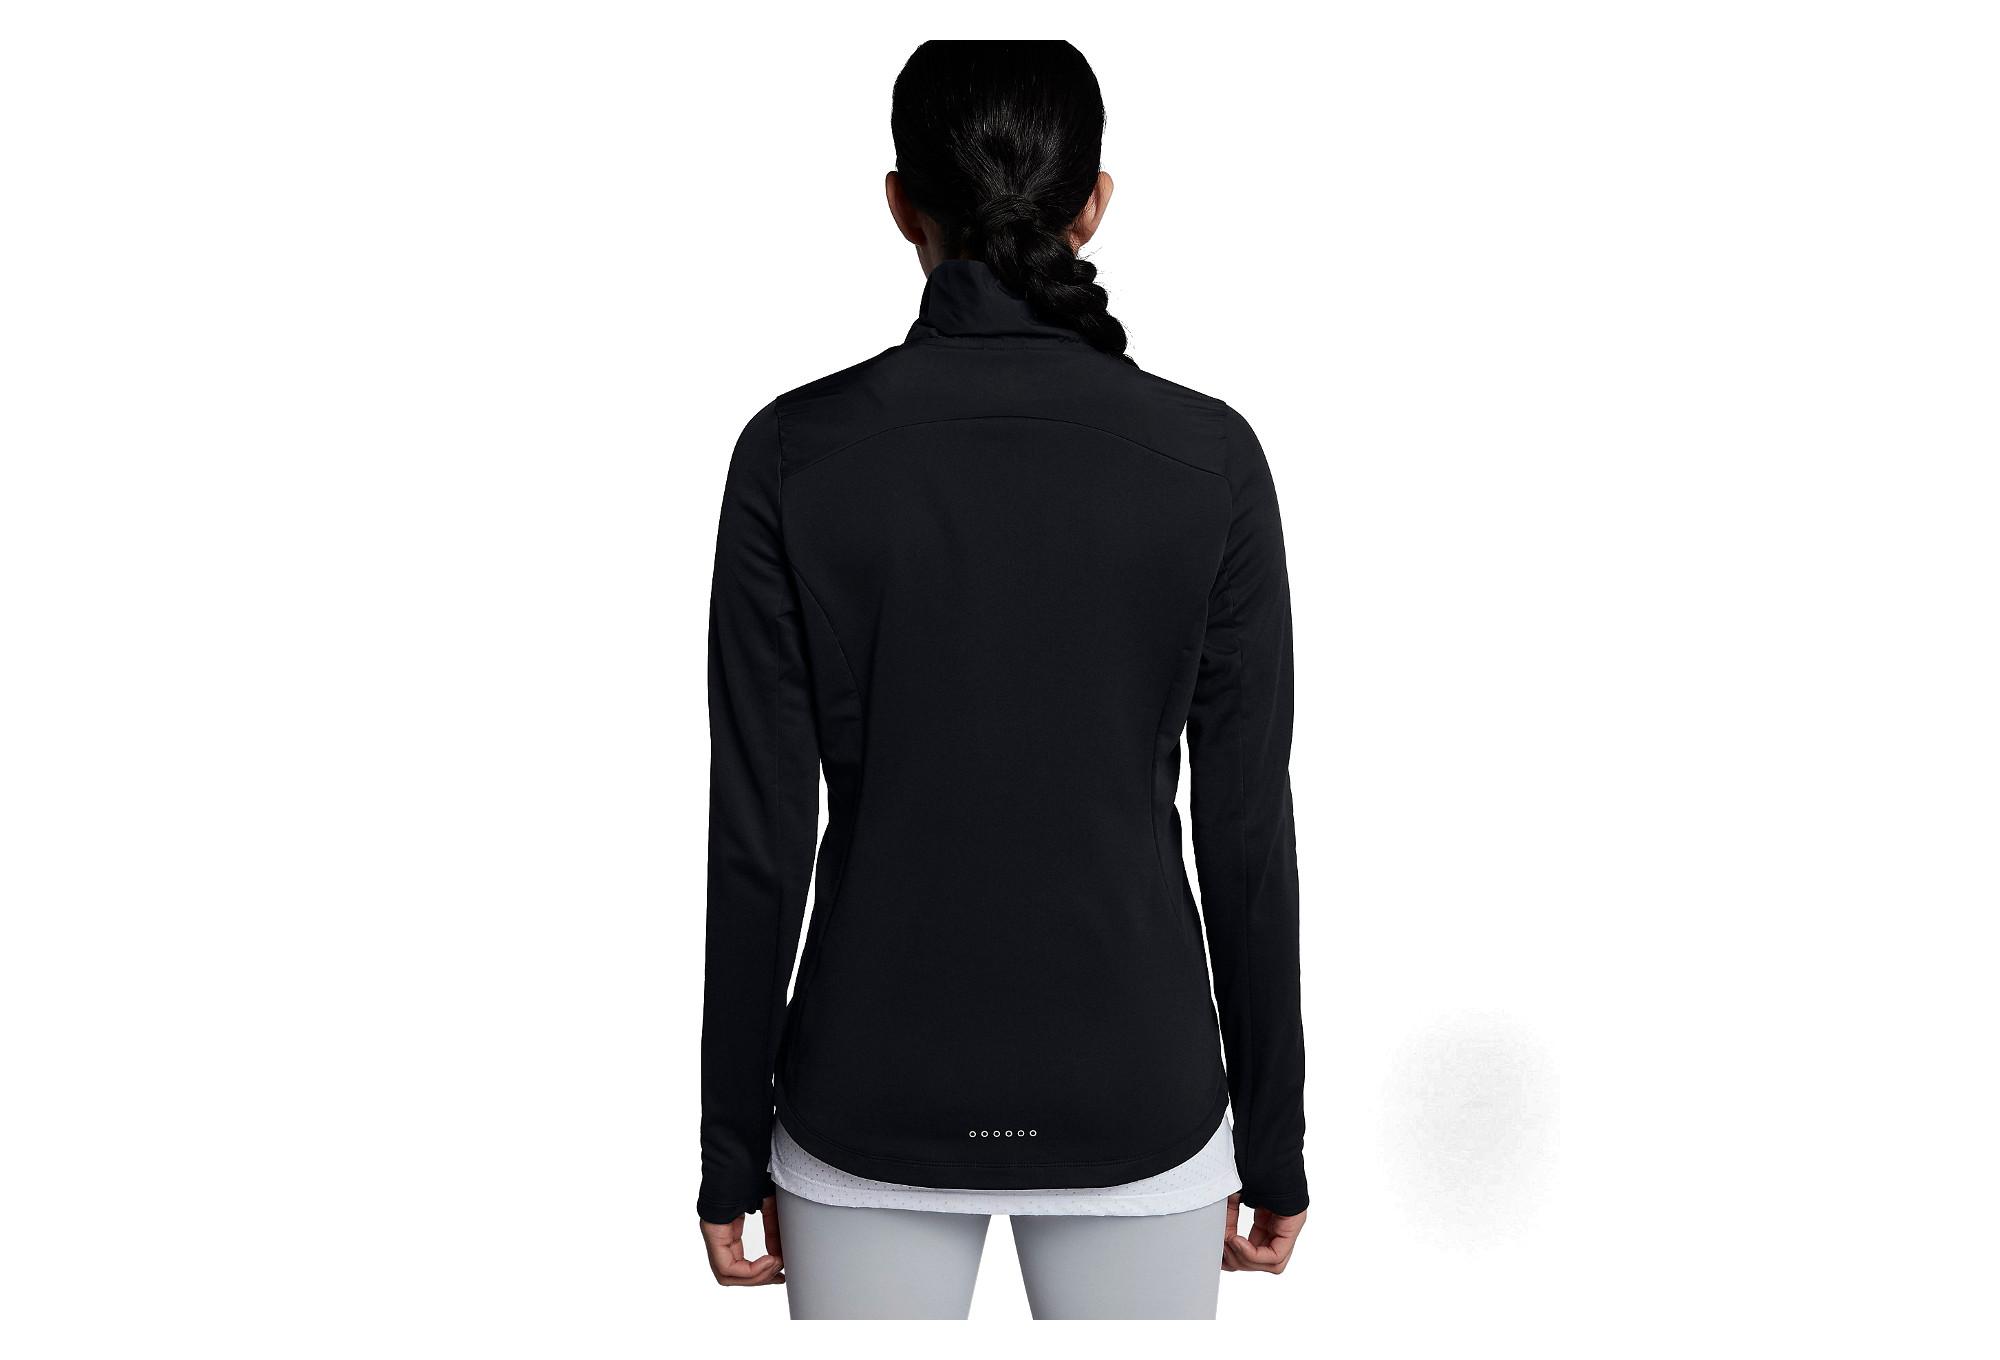 Essential Essential Noir Femme Nike Filled Veste OqzRw5